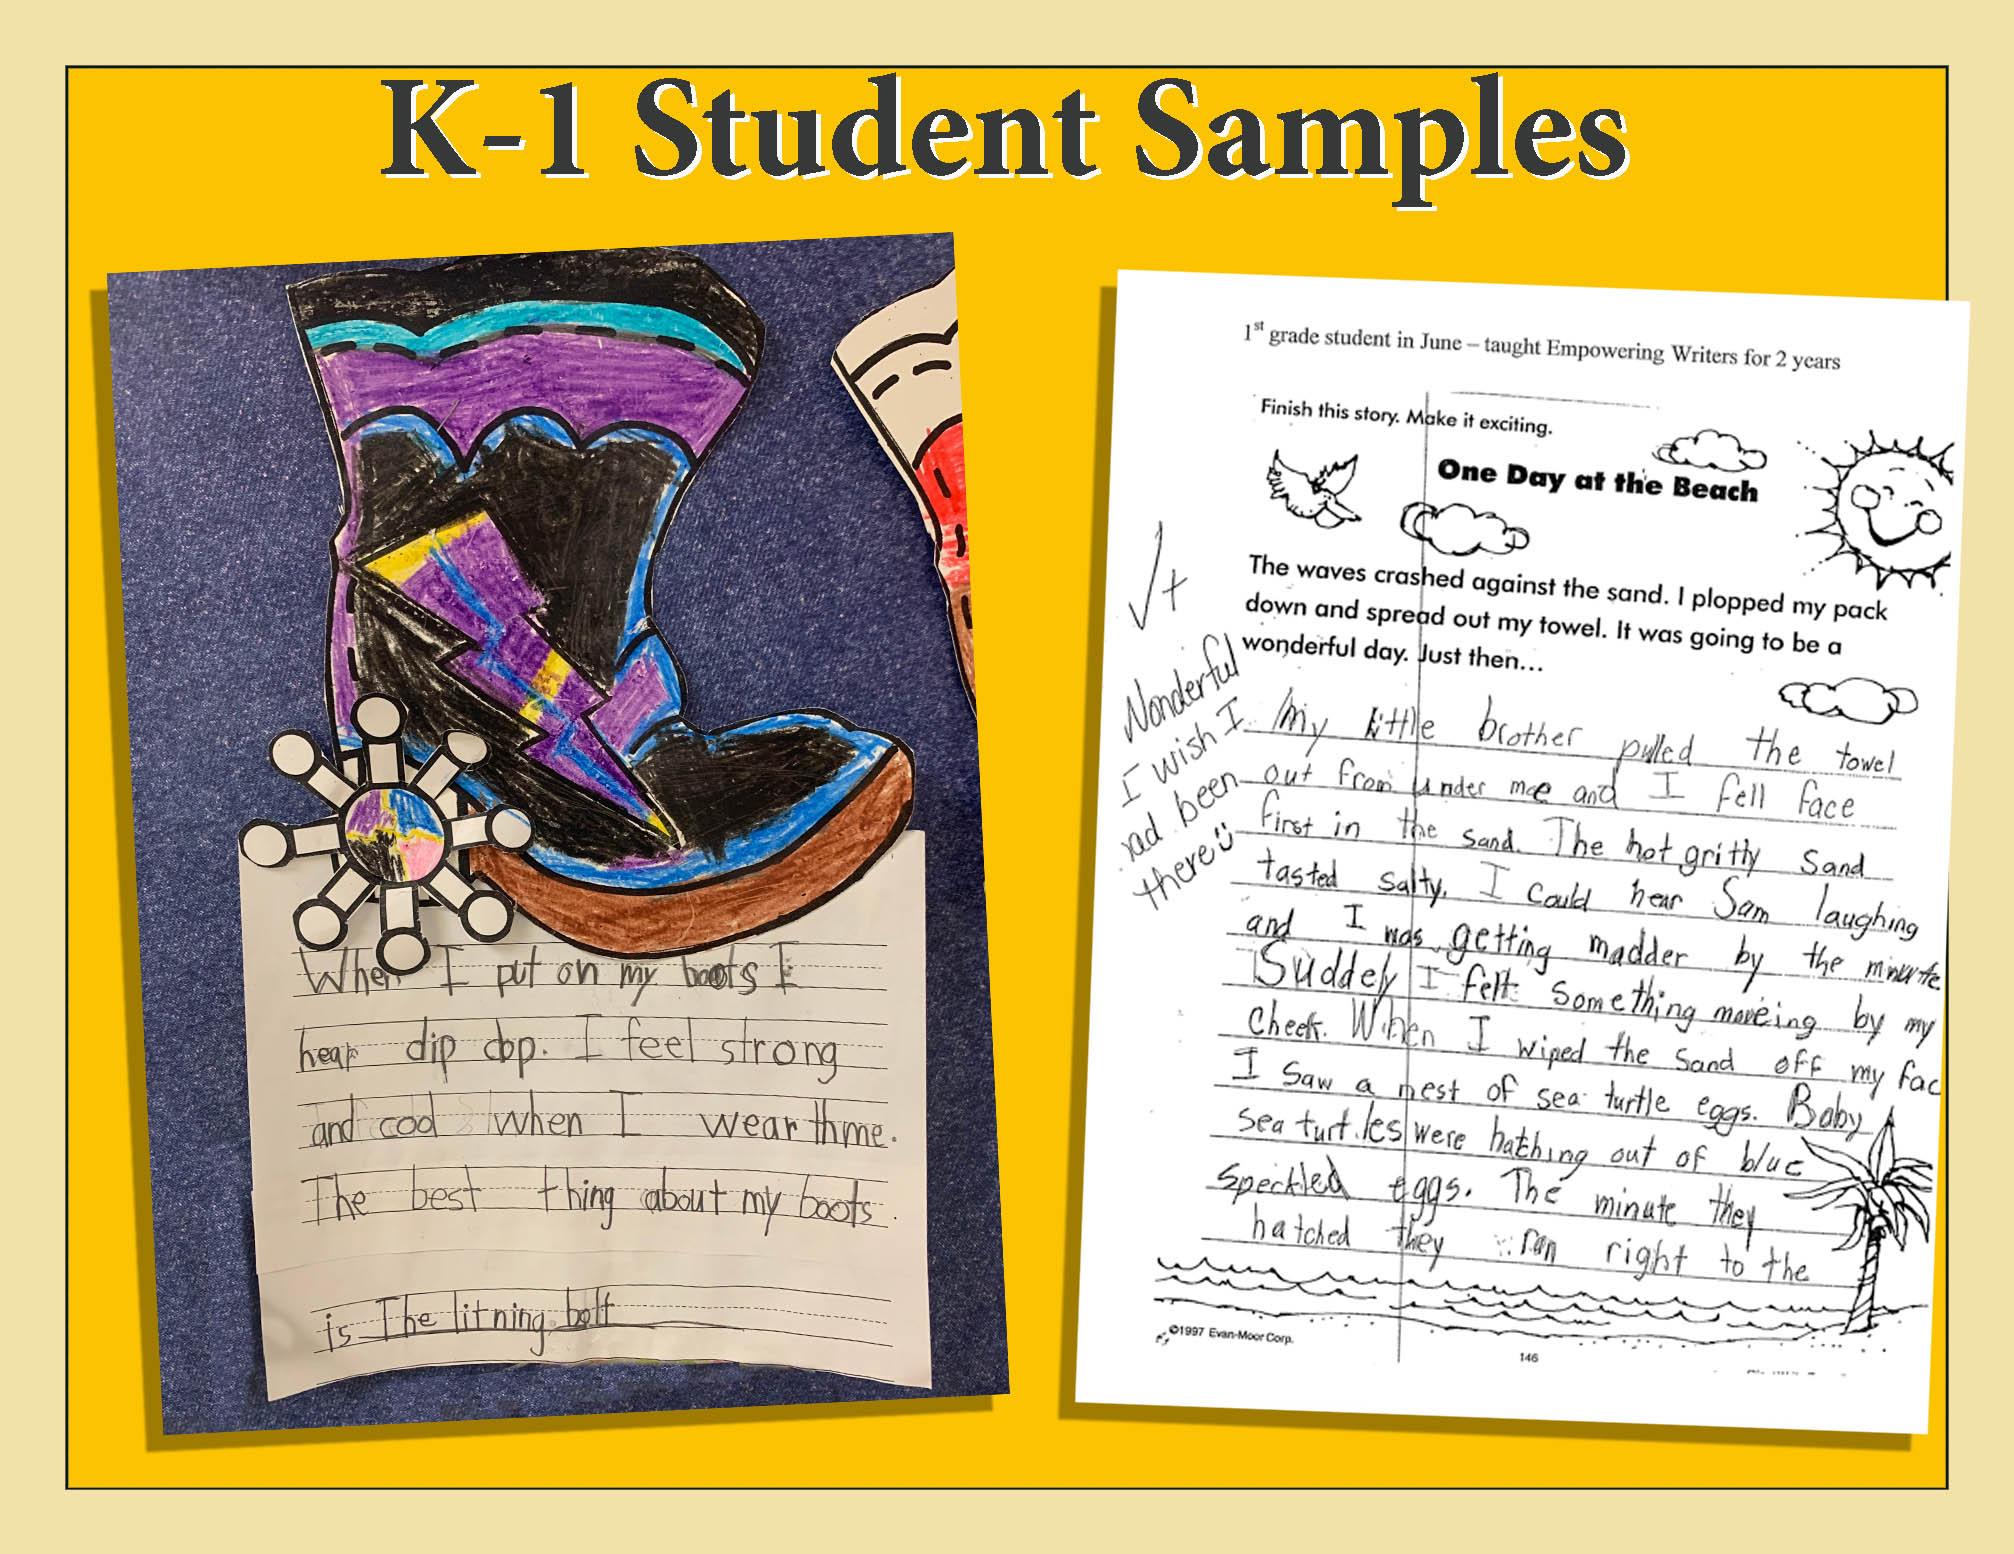 K1Student Samples Image